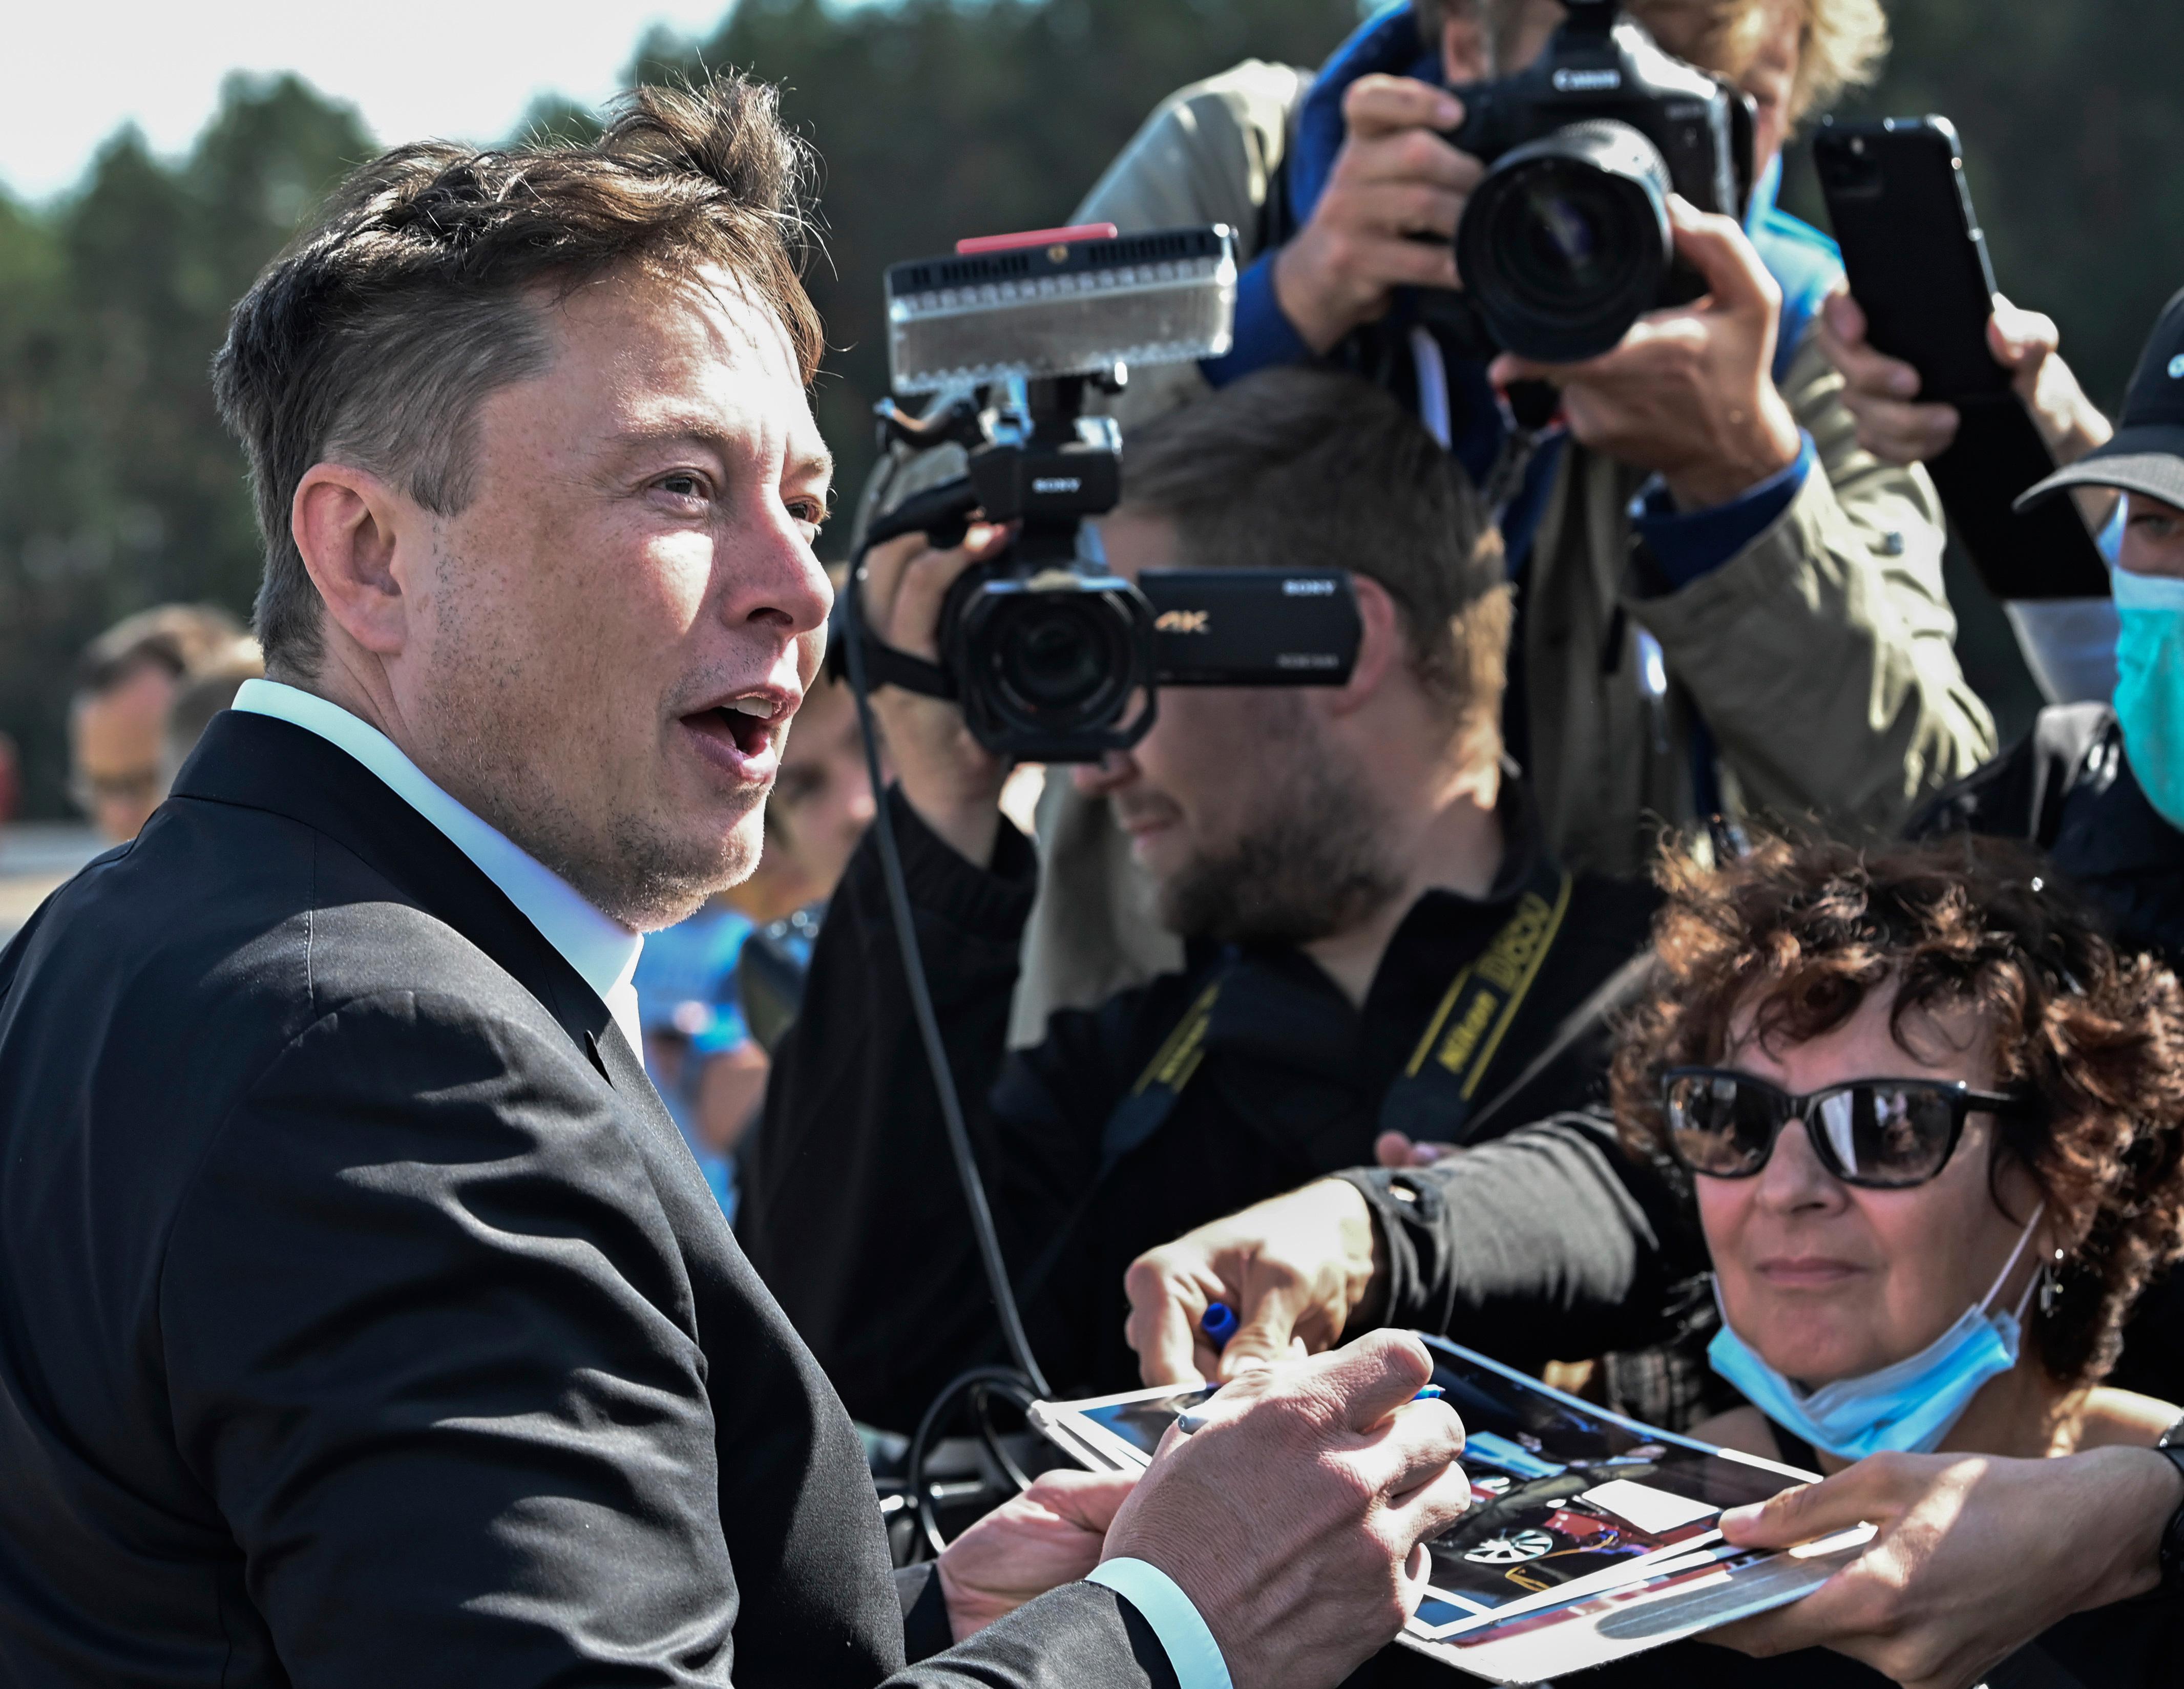 Technology entrepreneur Elon Musk gives autographs as he visits the Tesla Gigafactory construction site in Gruenheide near Berlin